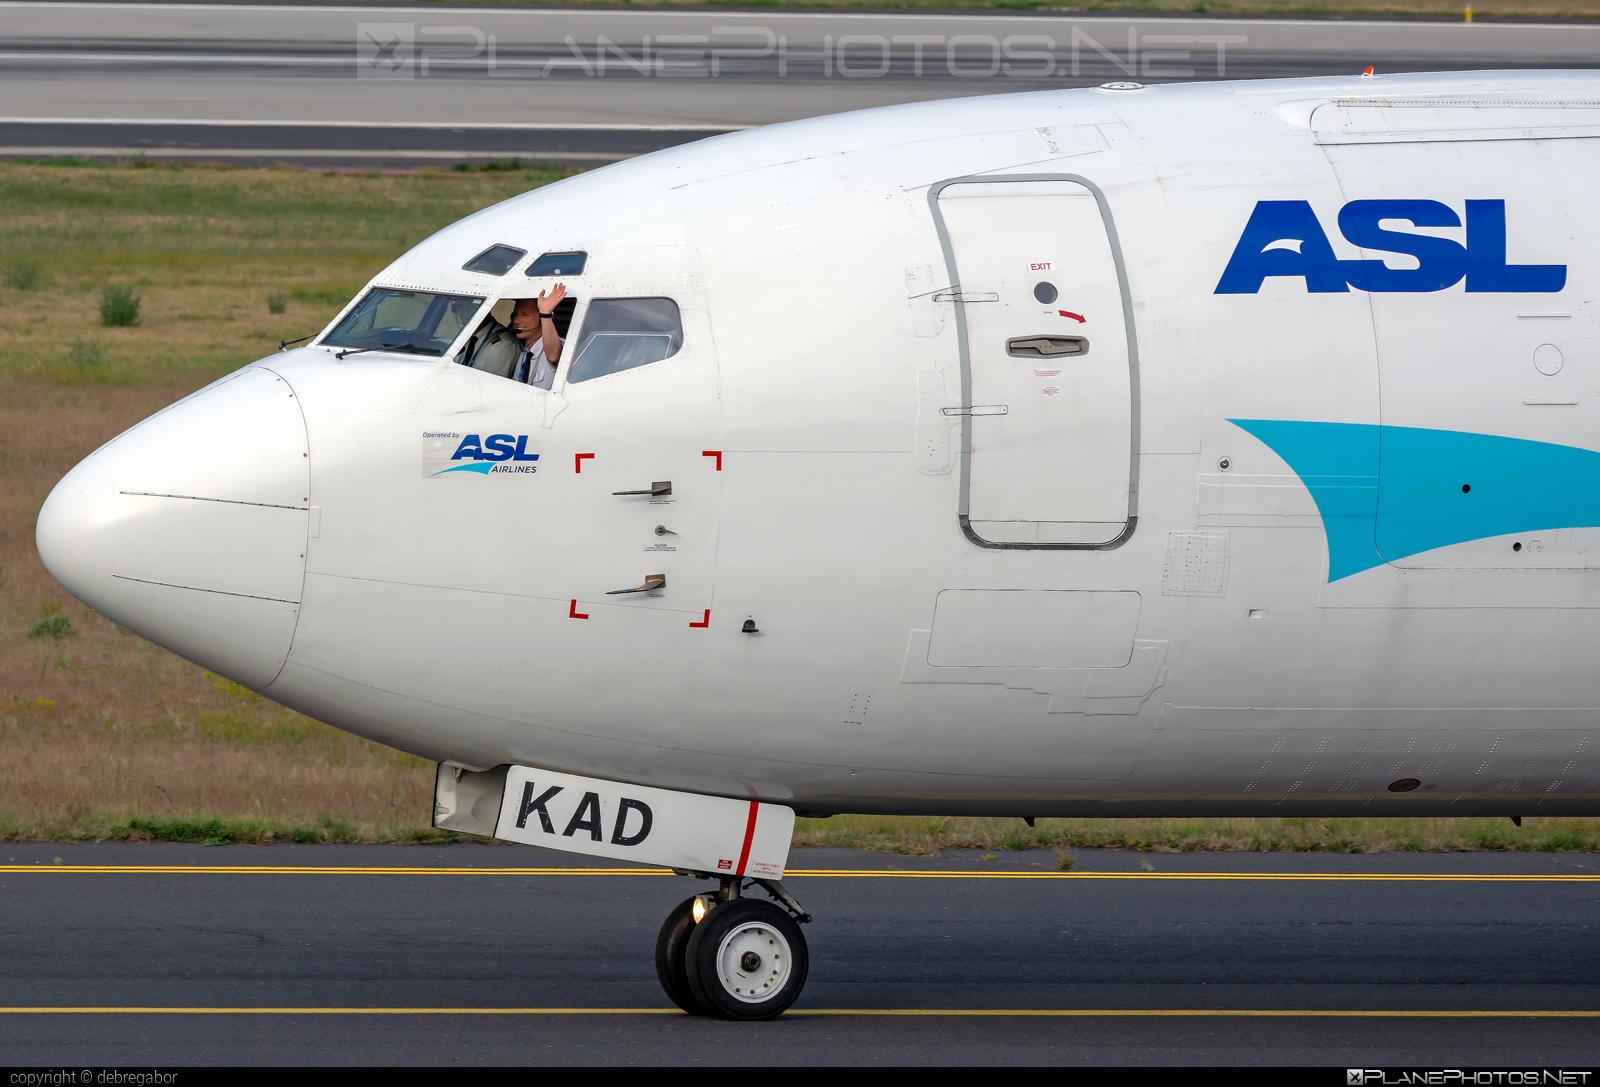 Boeing 737-400SF - HA-KAD operated by ASL Airlines Hungary #aslairlines #aslairlineshungary #b737 #b737freighter #b737sf #boeing #boeing737